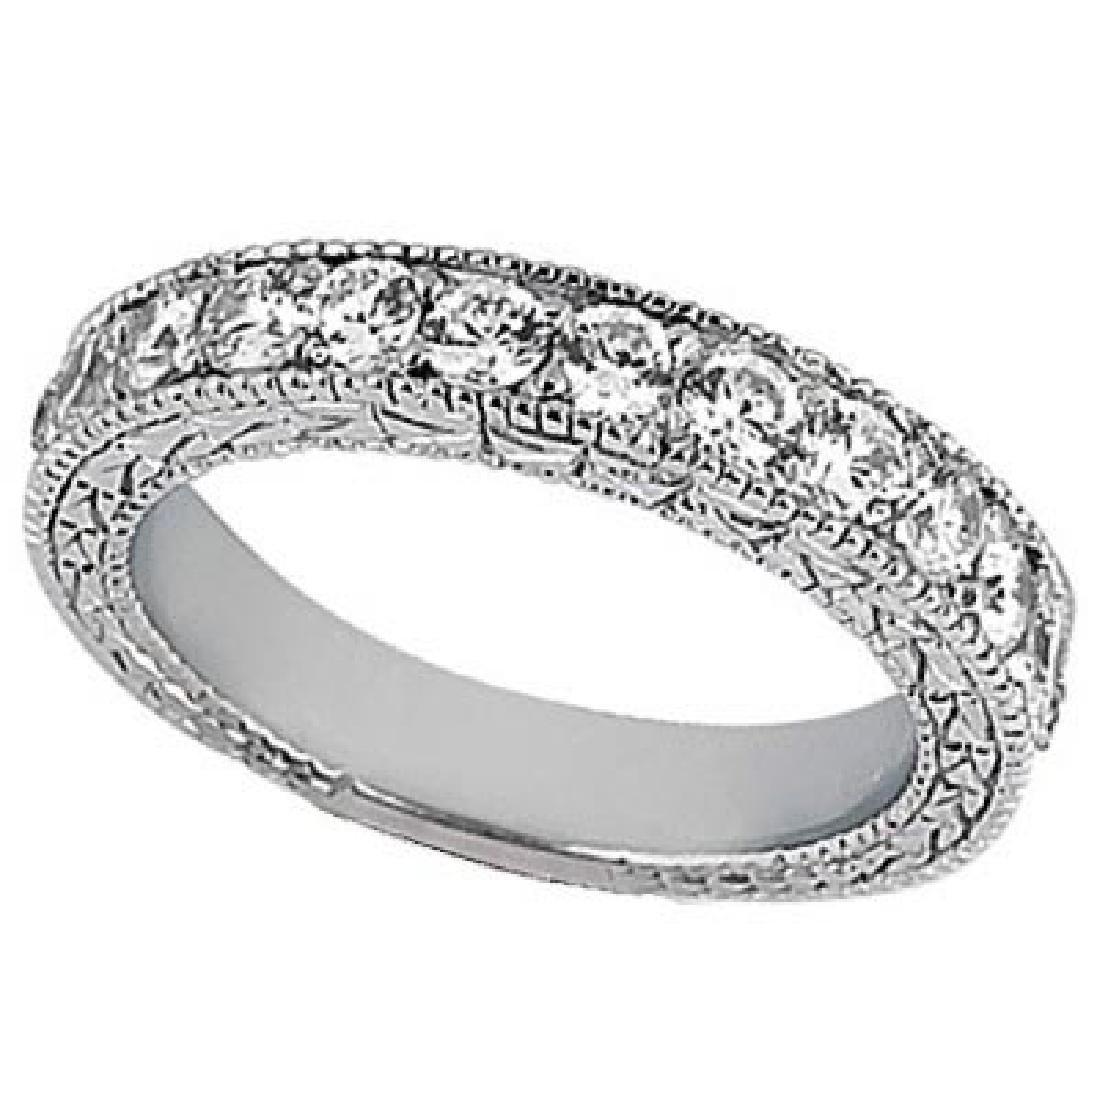 Antique Style Pave Set Wedding Ring Band 14k White Gold